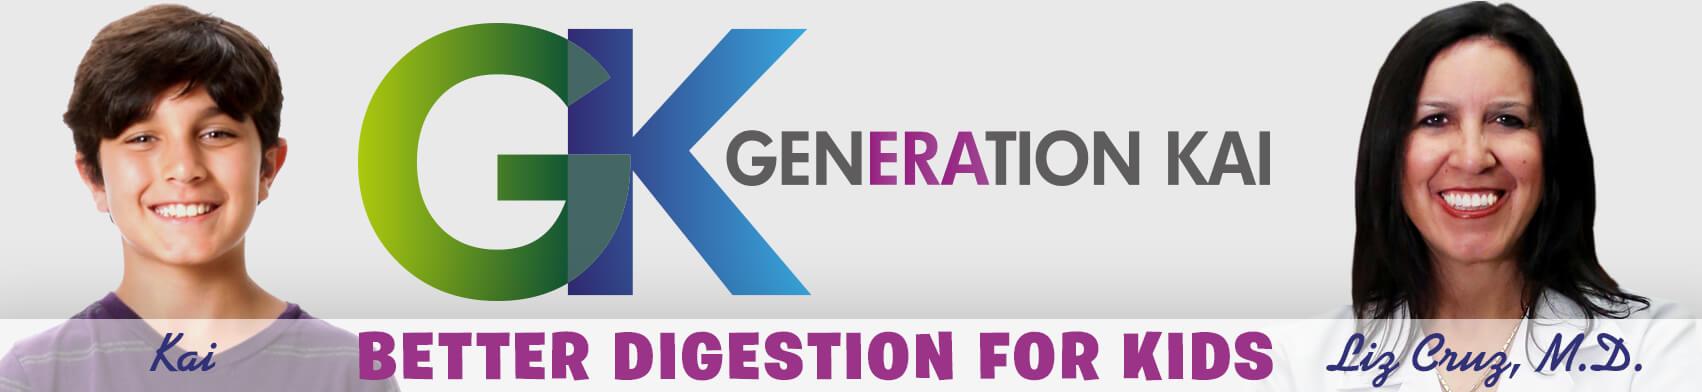 Generation Kai